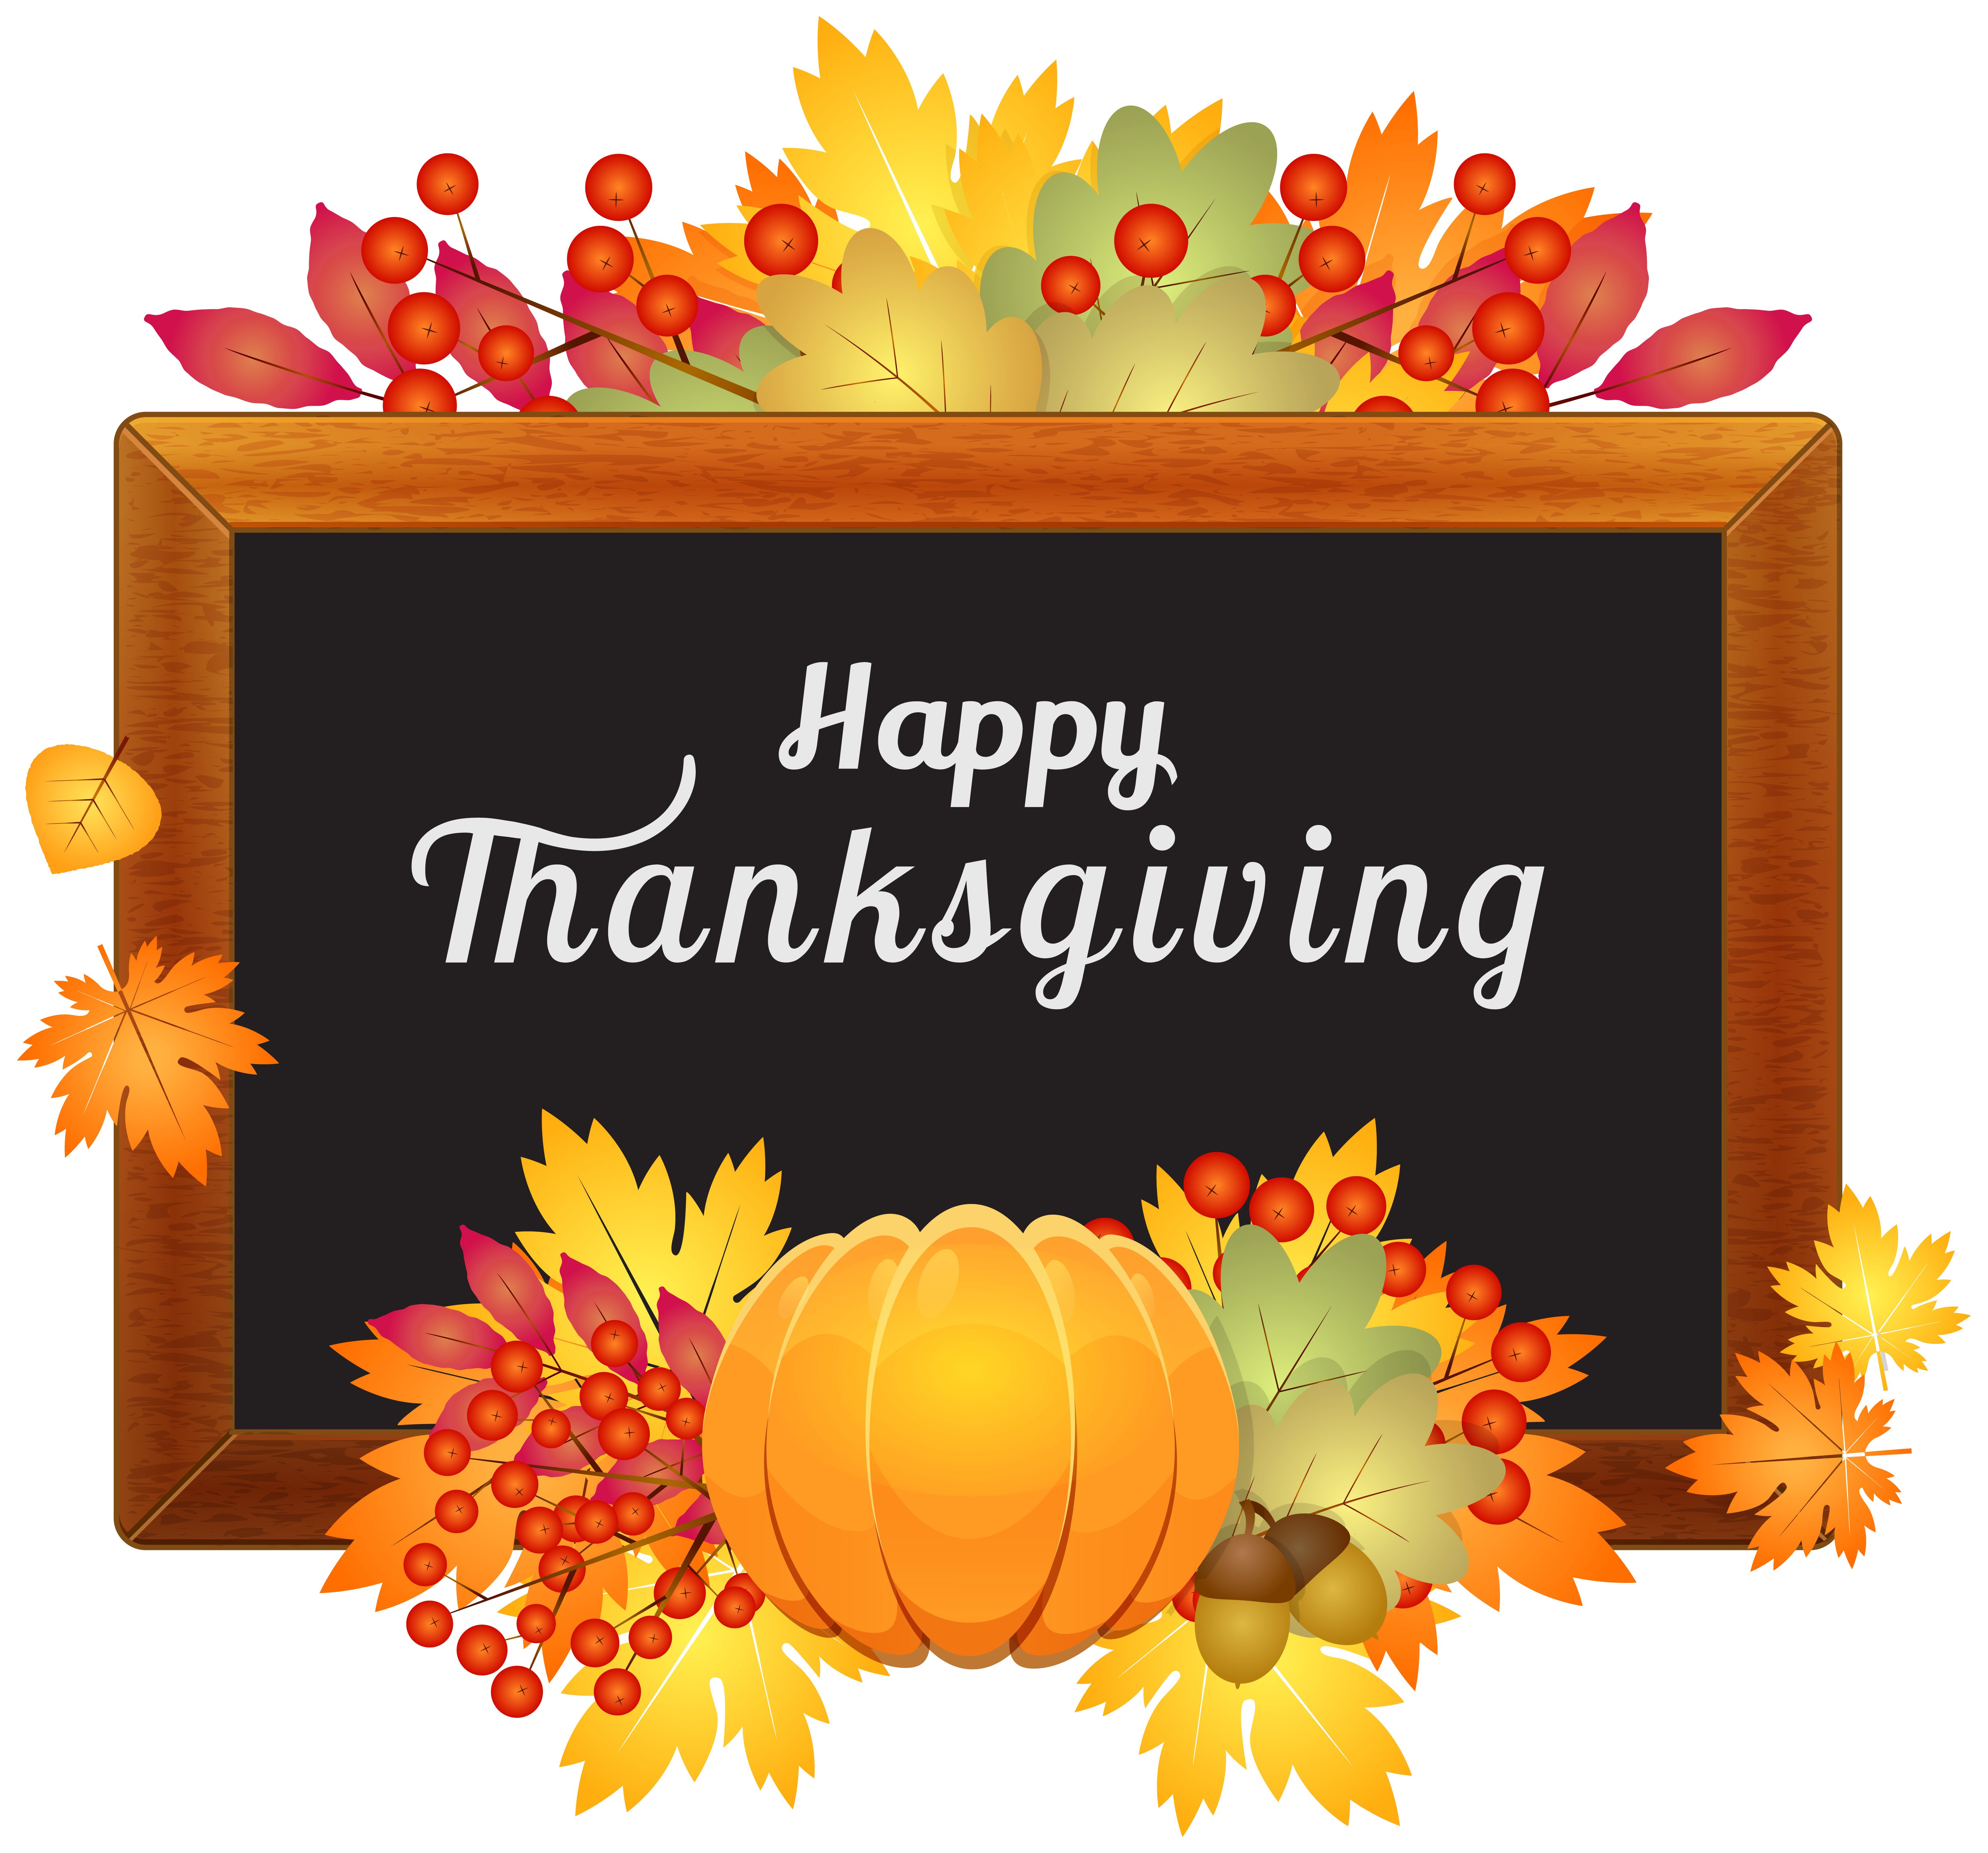 Happy thanksgiving decor png. Clipart turkey translucent